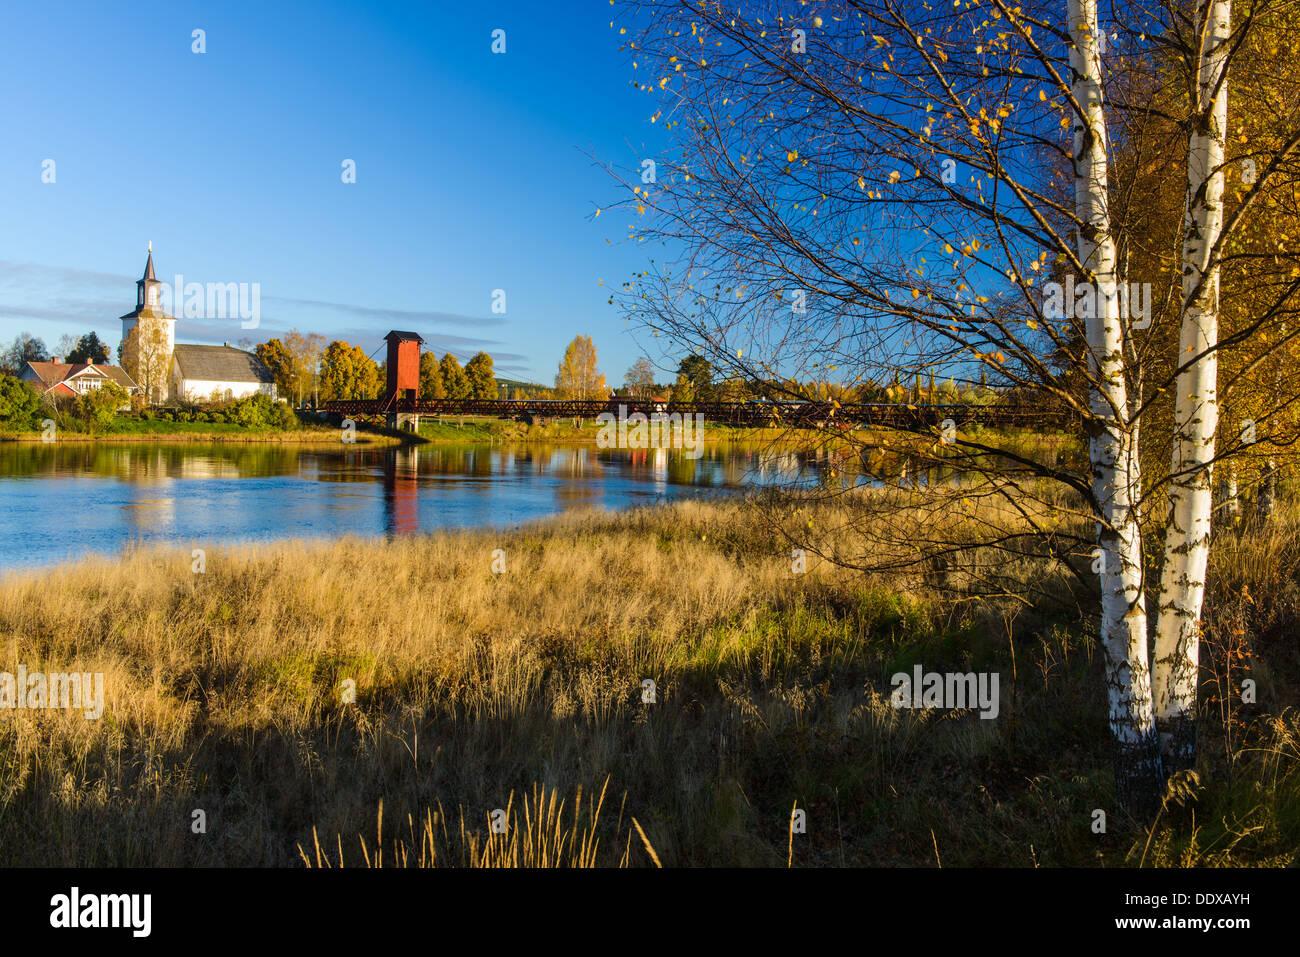 Church and lake, Dala-Floda, Dalarna, Sweden - Stock Image